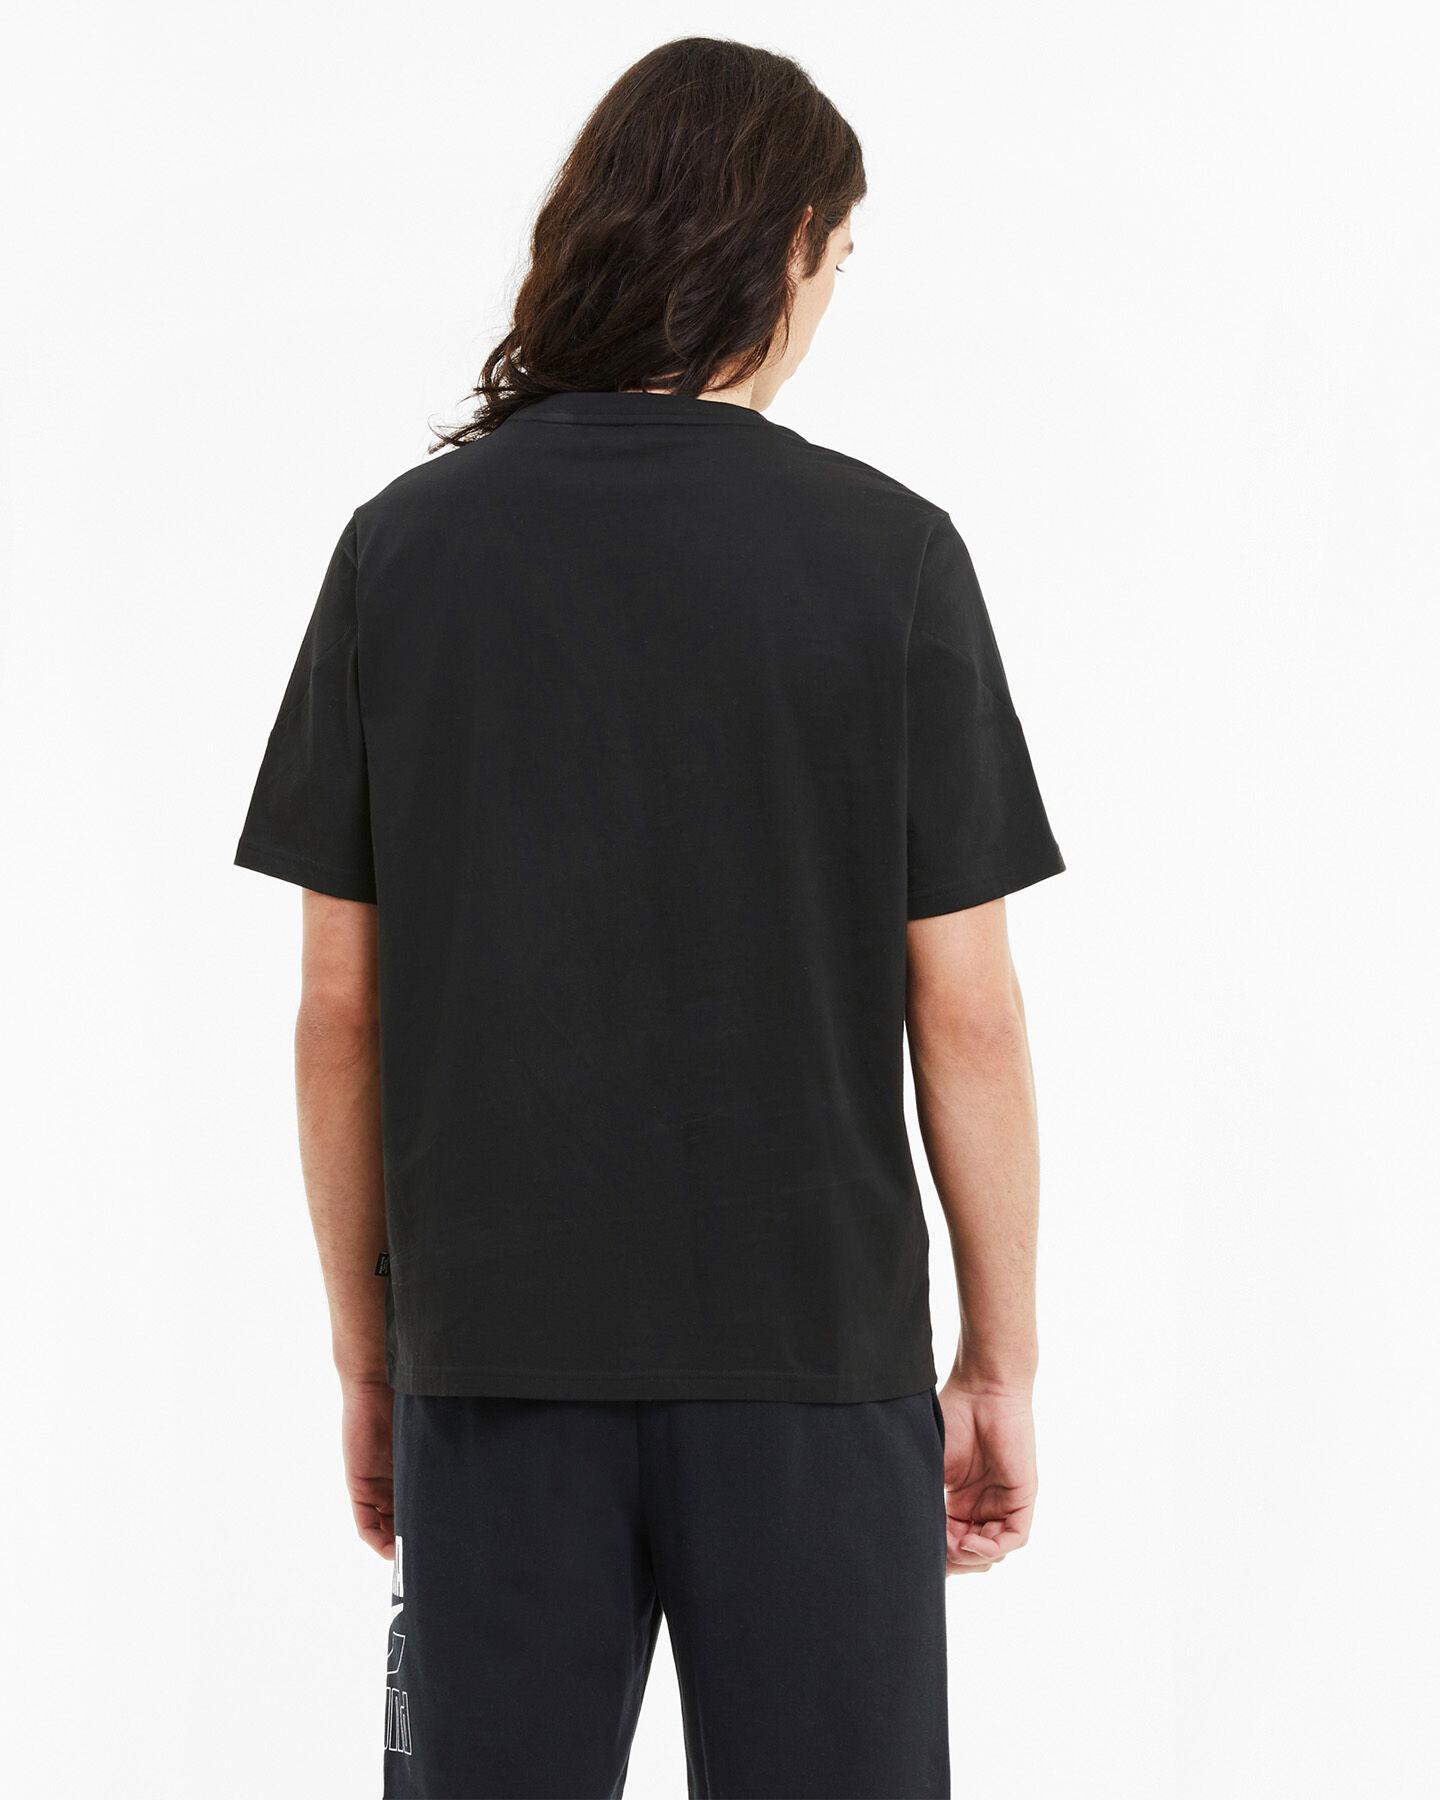 T-Shirt PUMA REBEL ADVANCED M S5235149 scatto 3